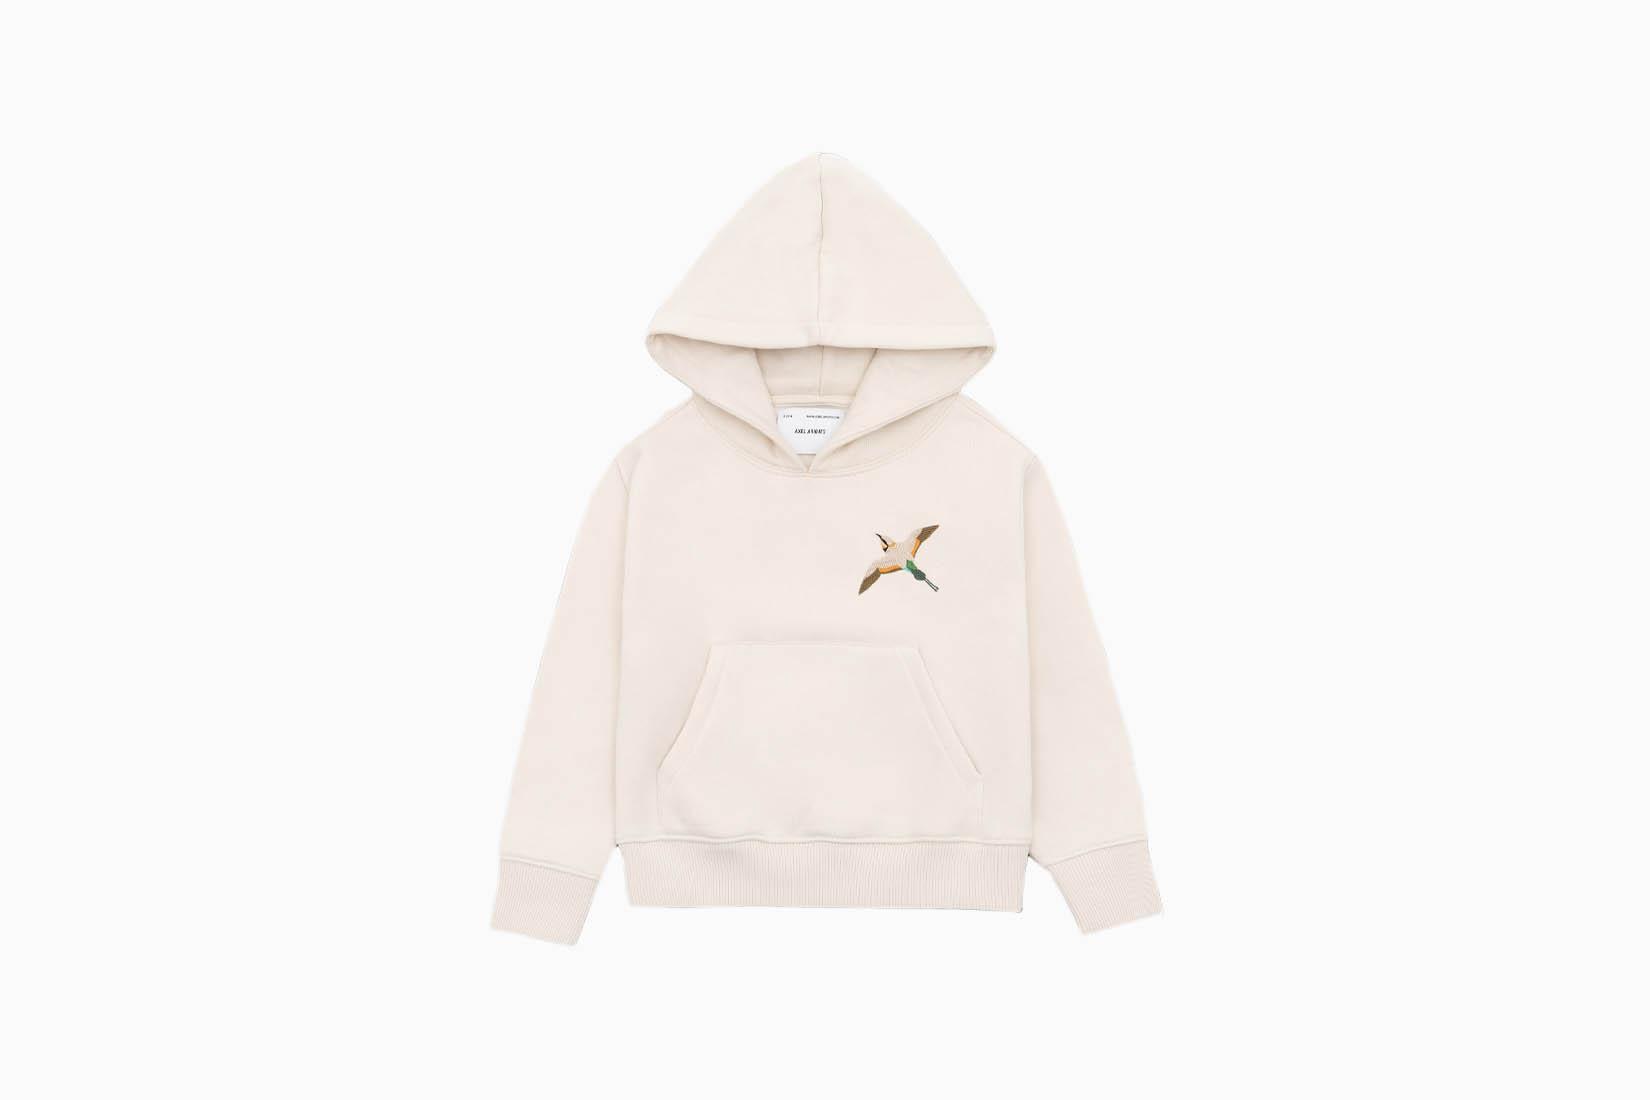 best gift kids arigato hoodie review Luxe Digital